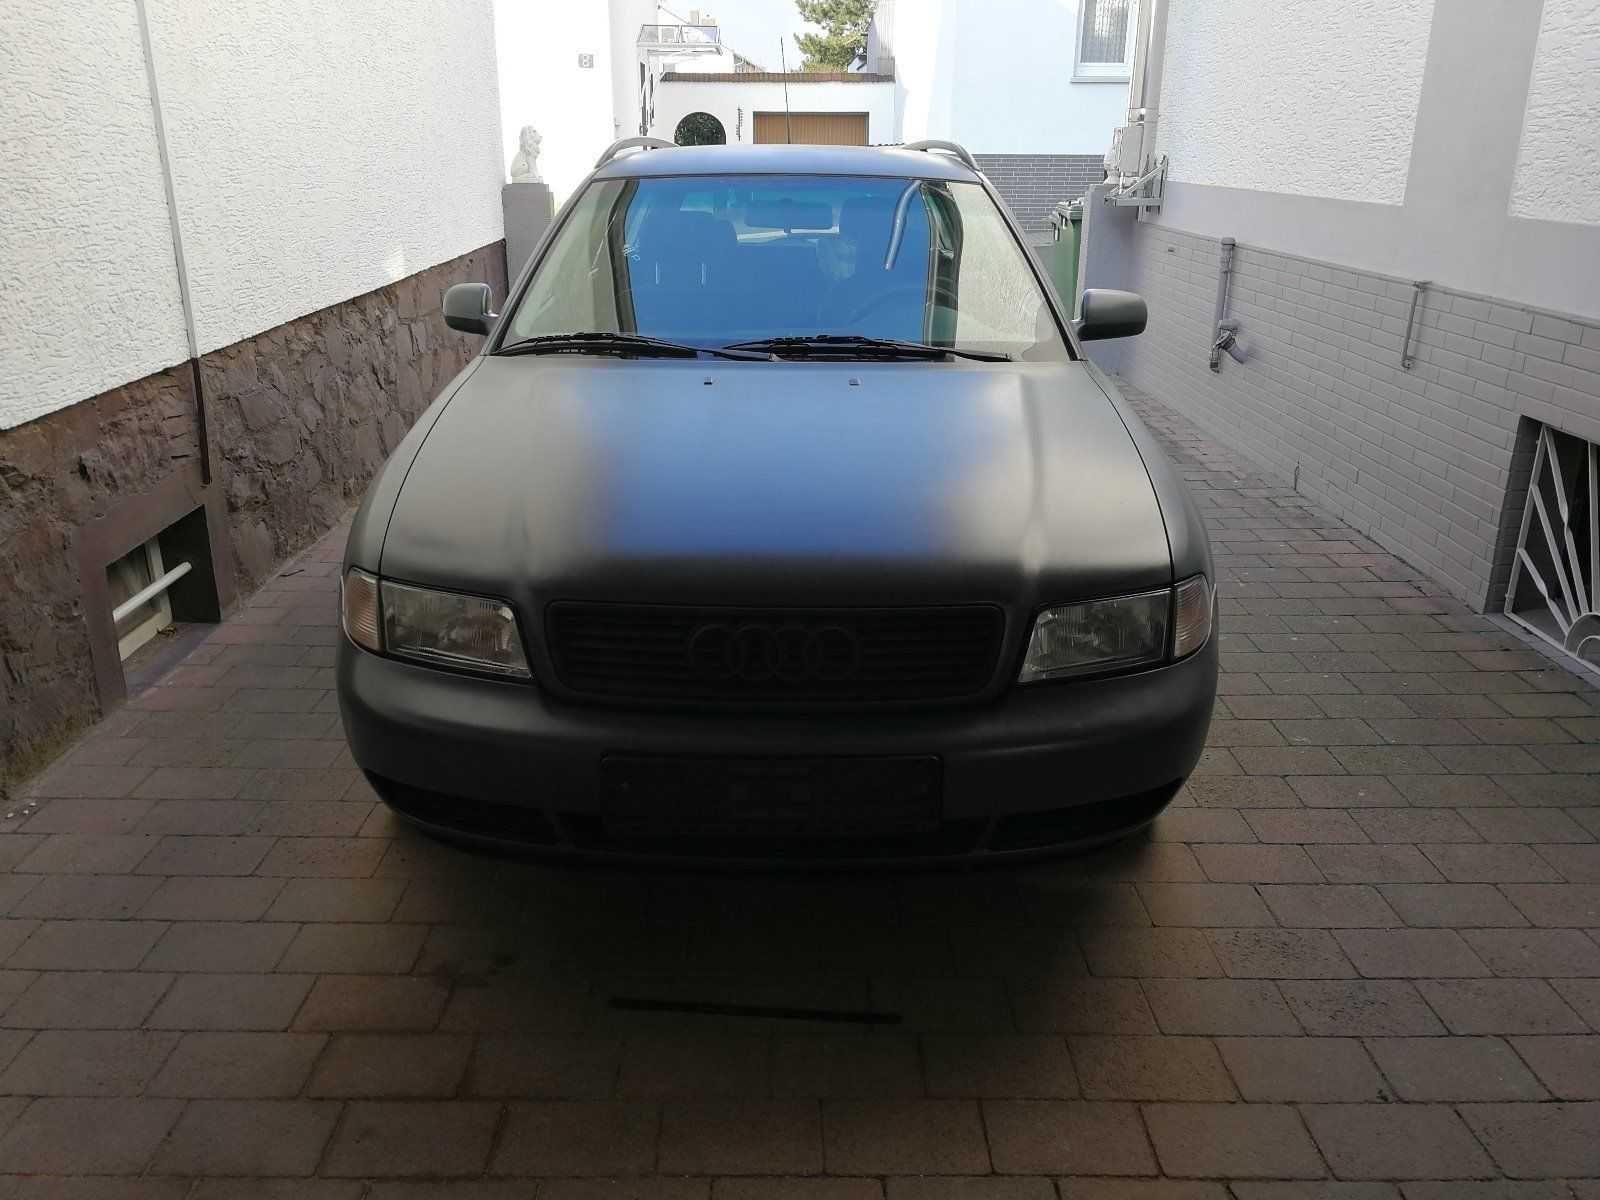 Hadeco GlasDesign Audi a4, Audi a4 b5, Audi